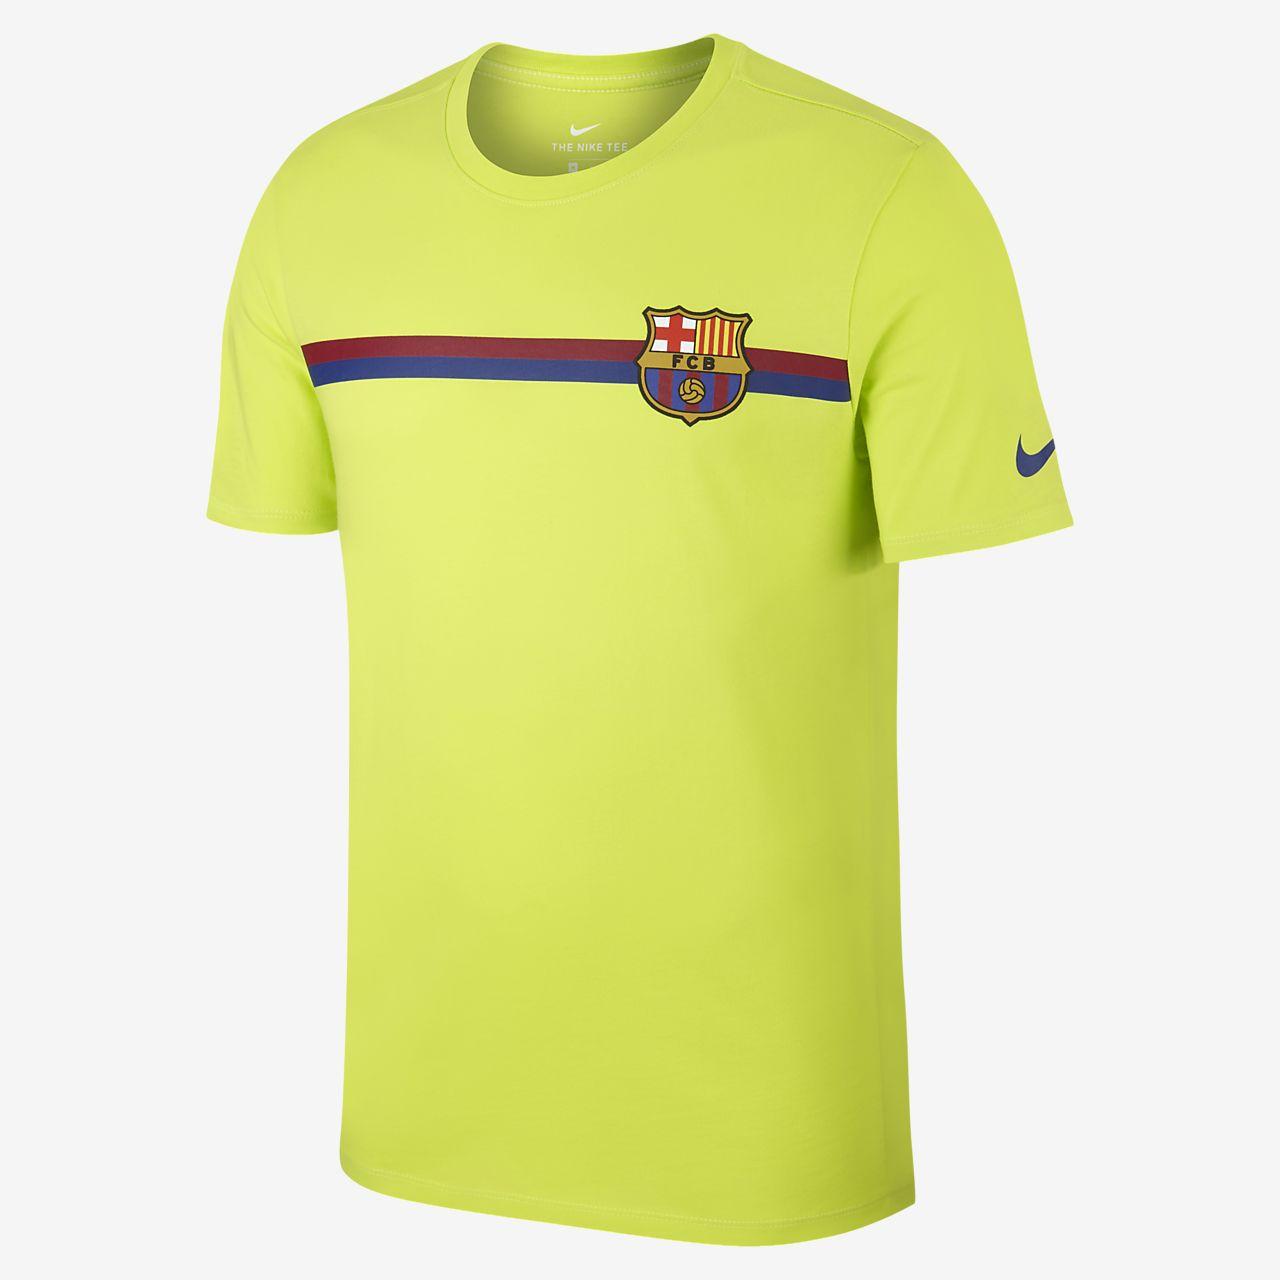 FC Barcelona Crest Camiseta - Hombre